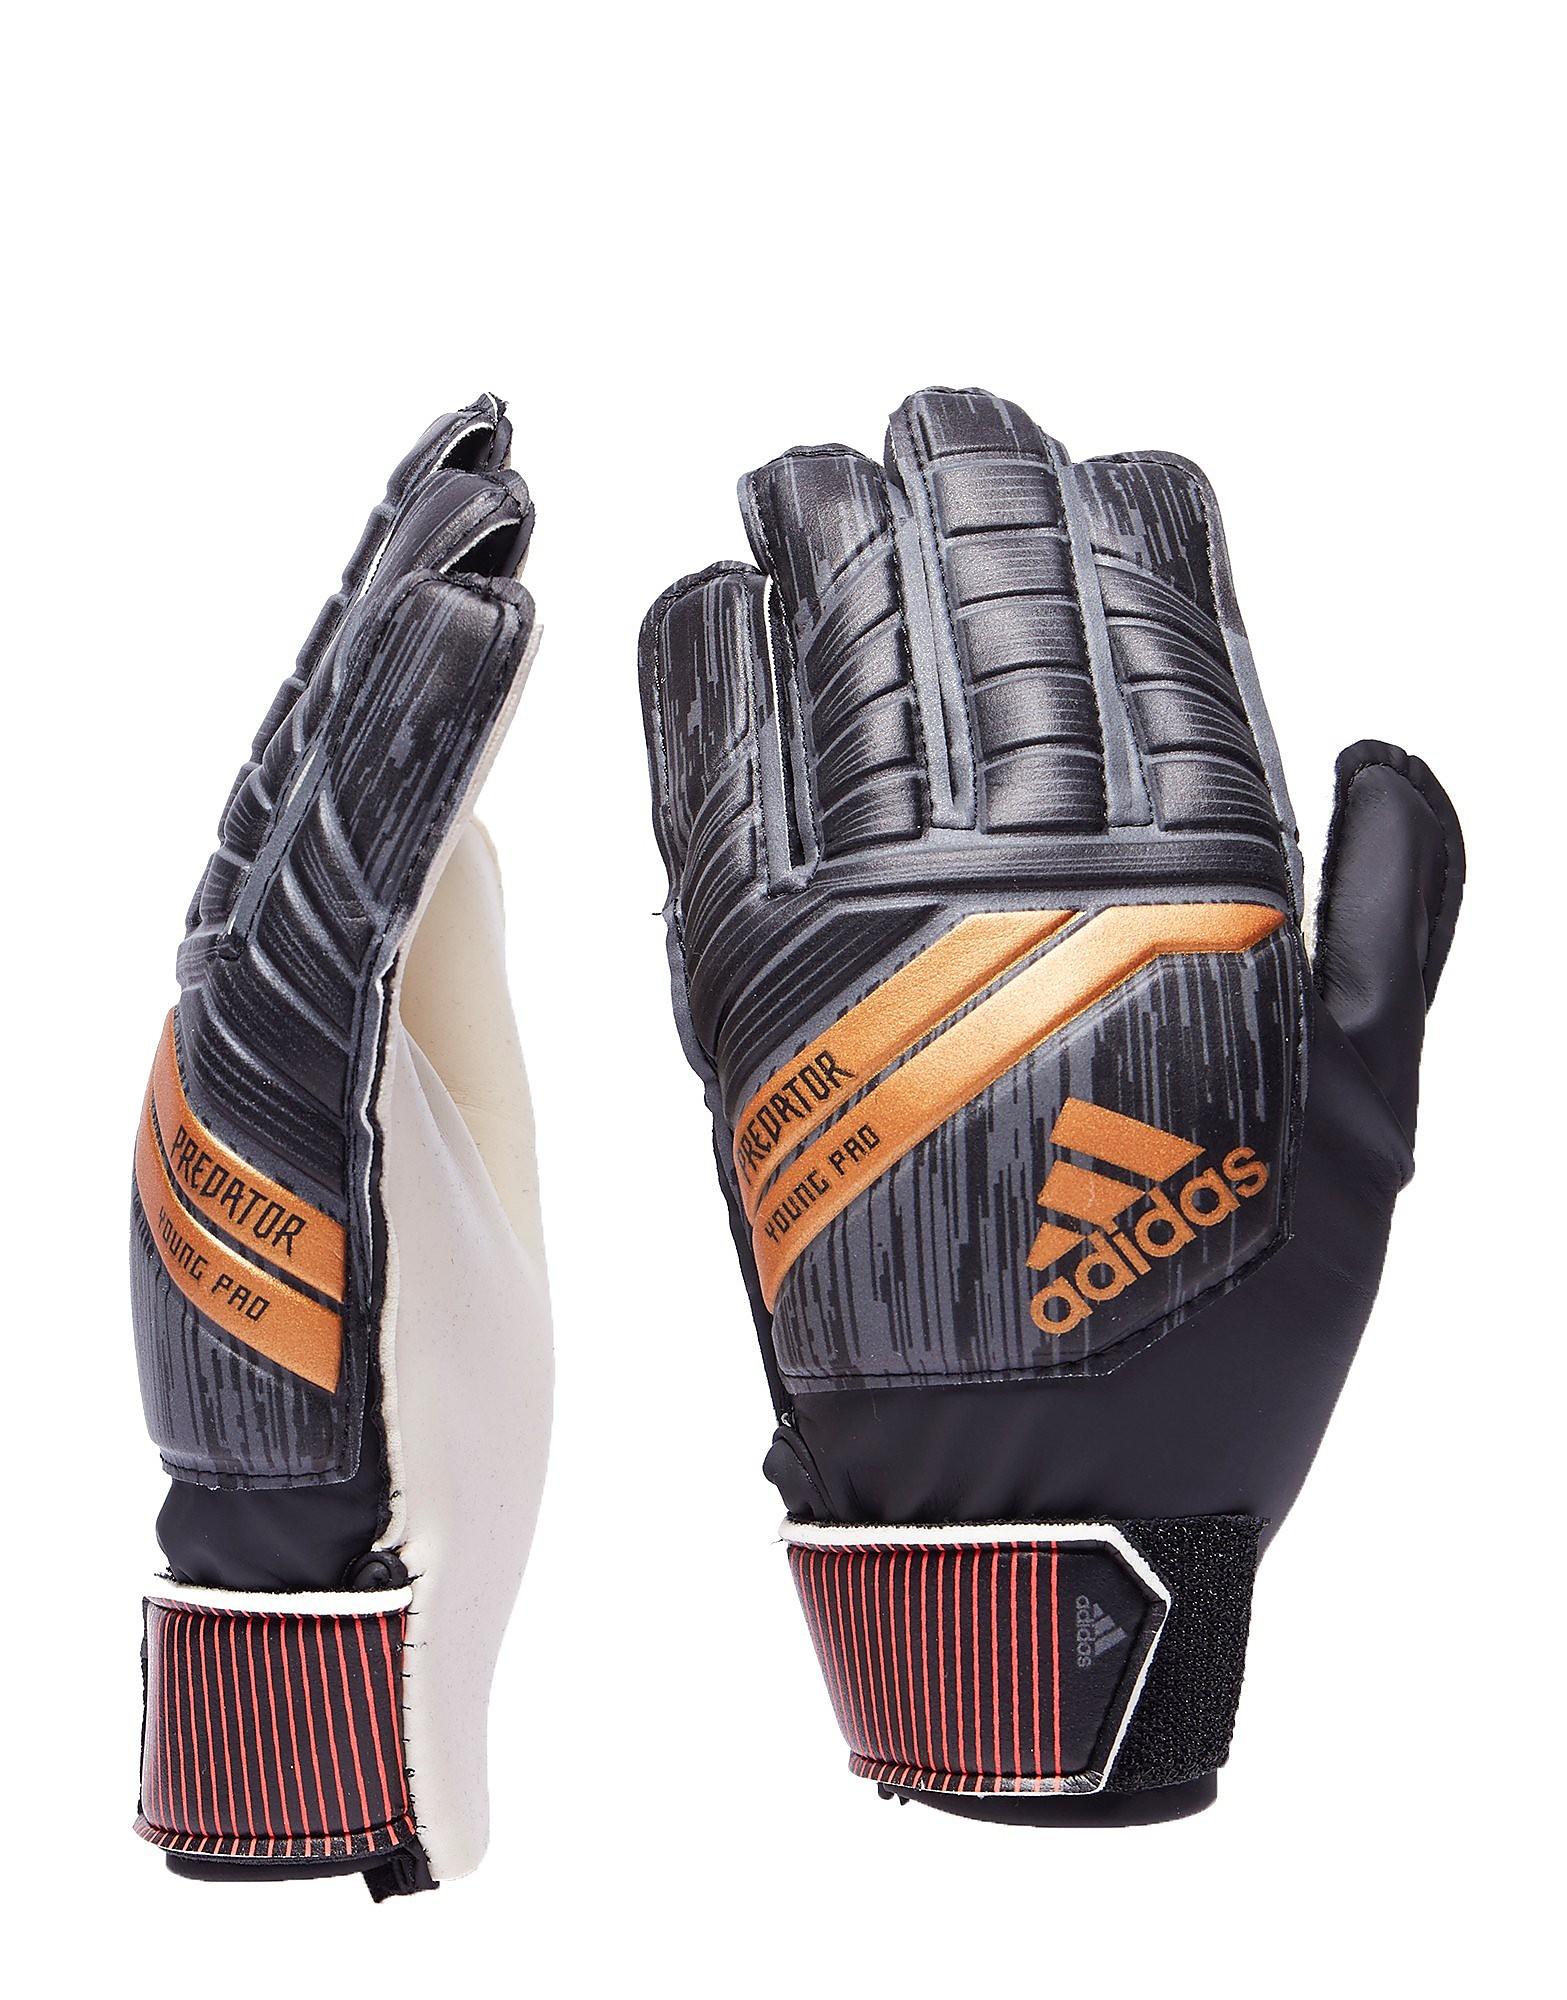 adidas Predator 18 Young Pro Goalkeeper Gloves Junior